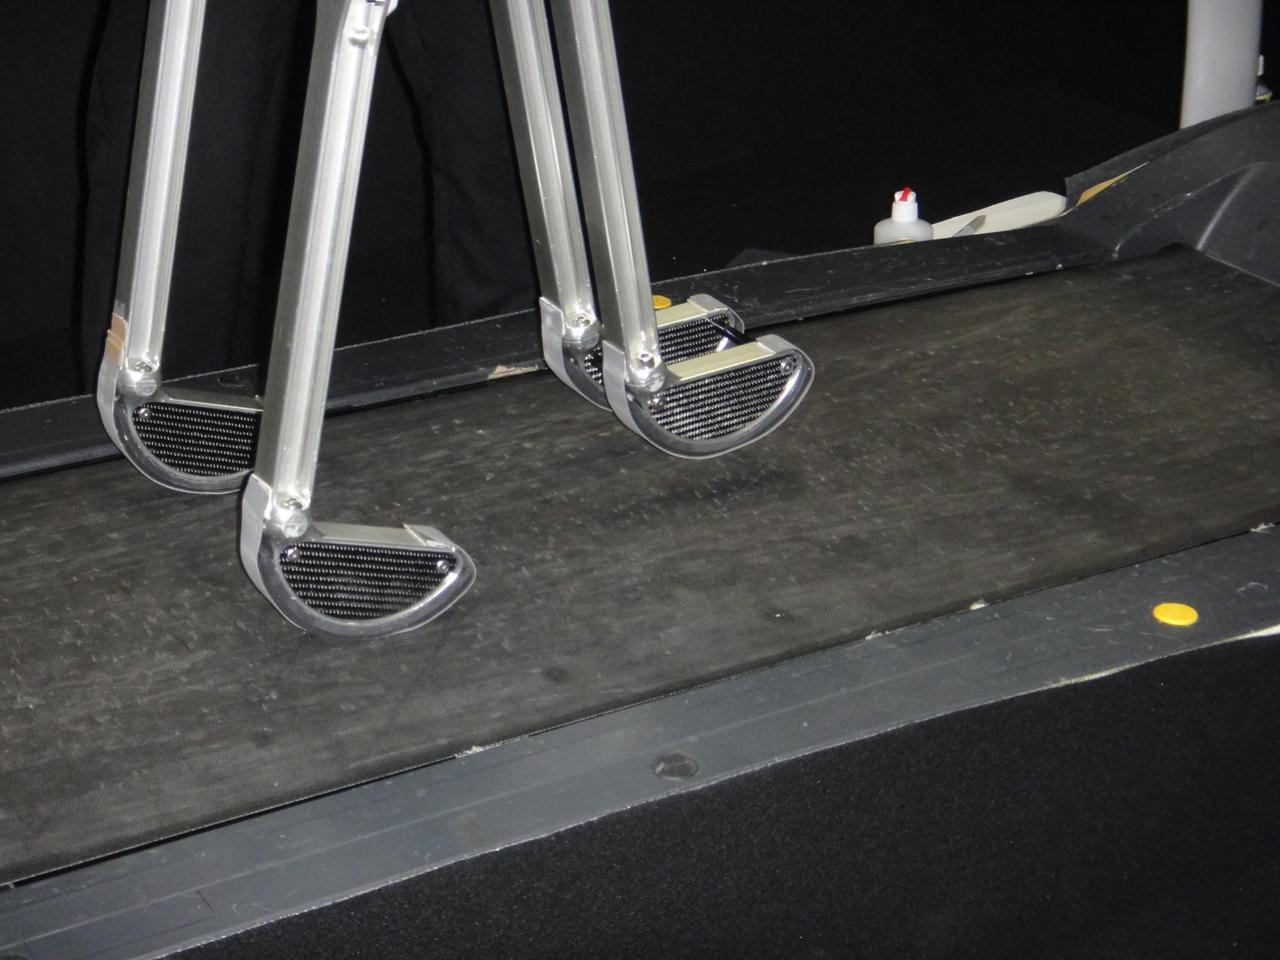 The biped walks on a treadmill (Photo: Diginfo.tv)